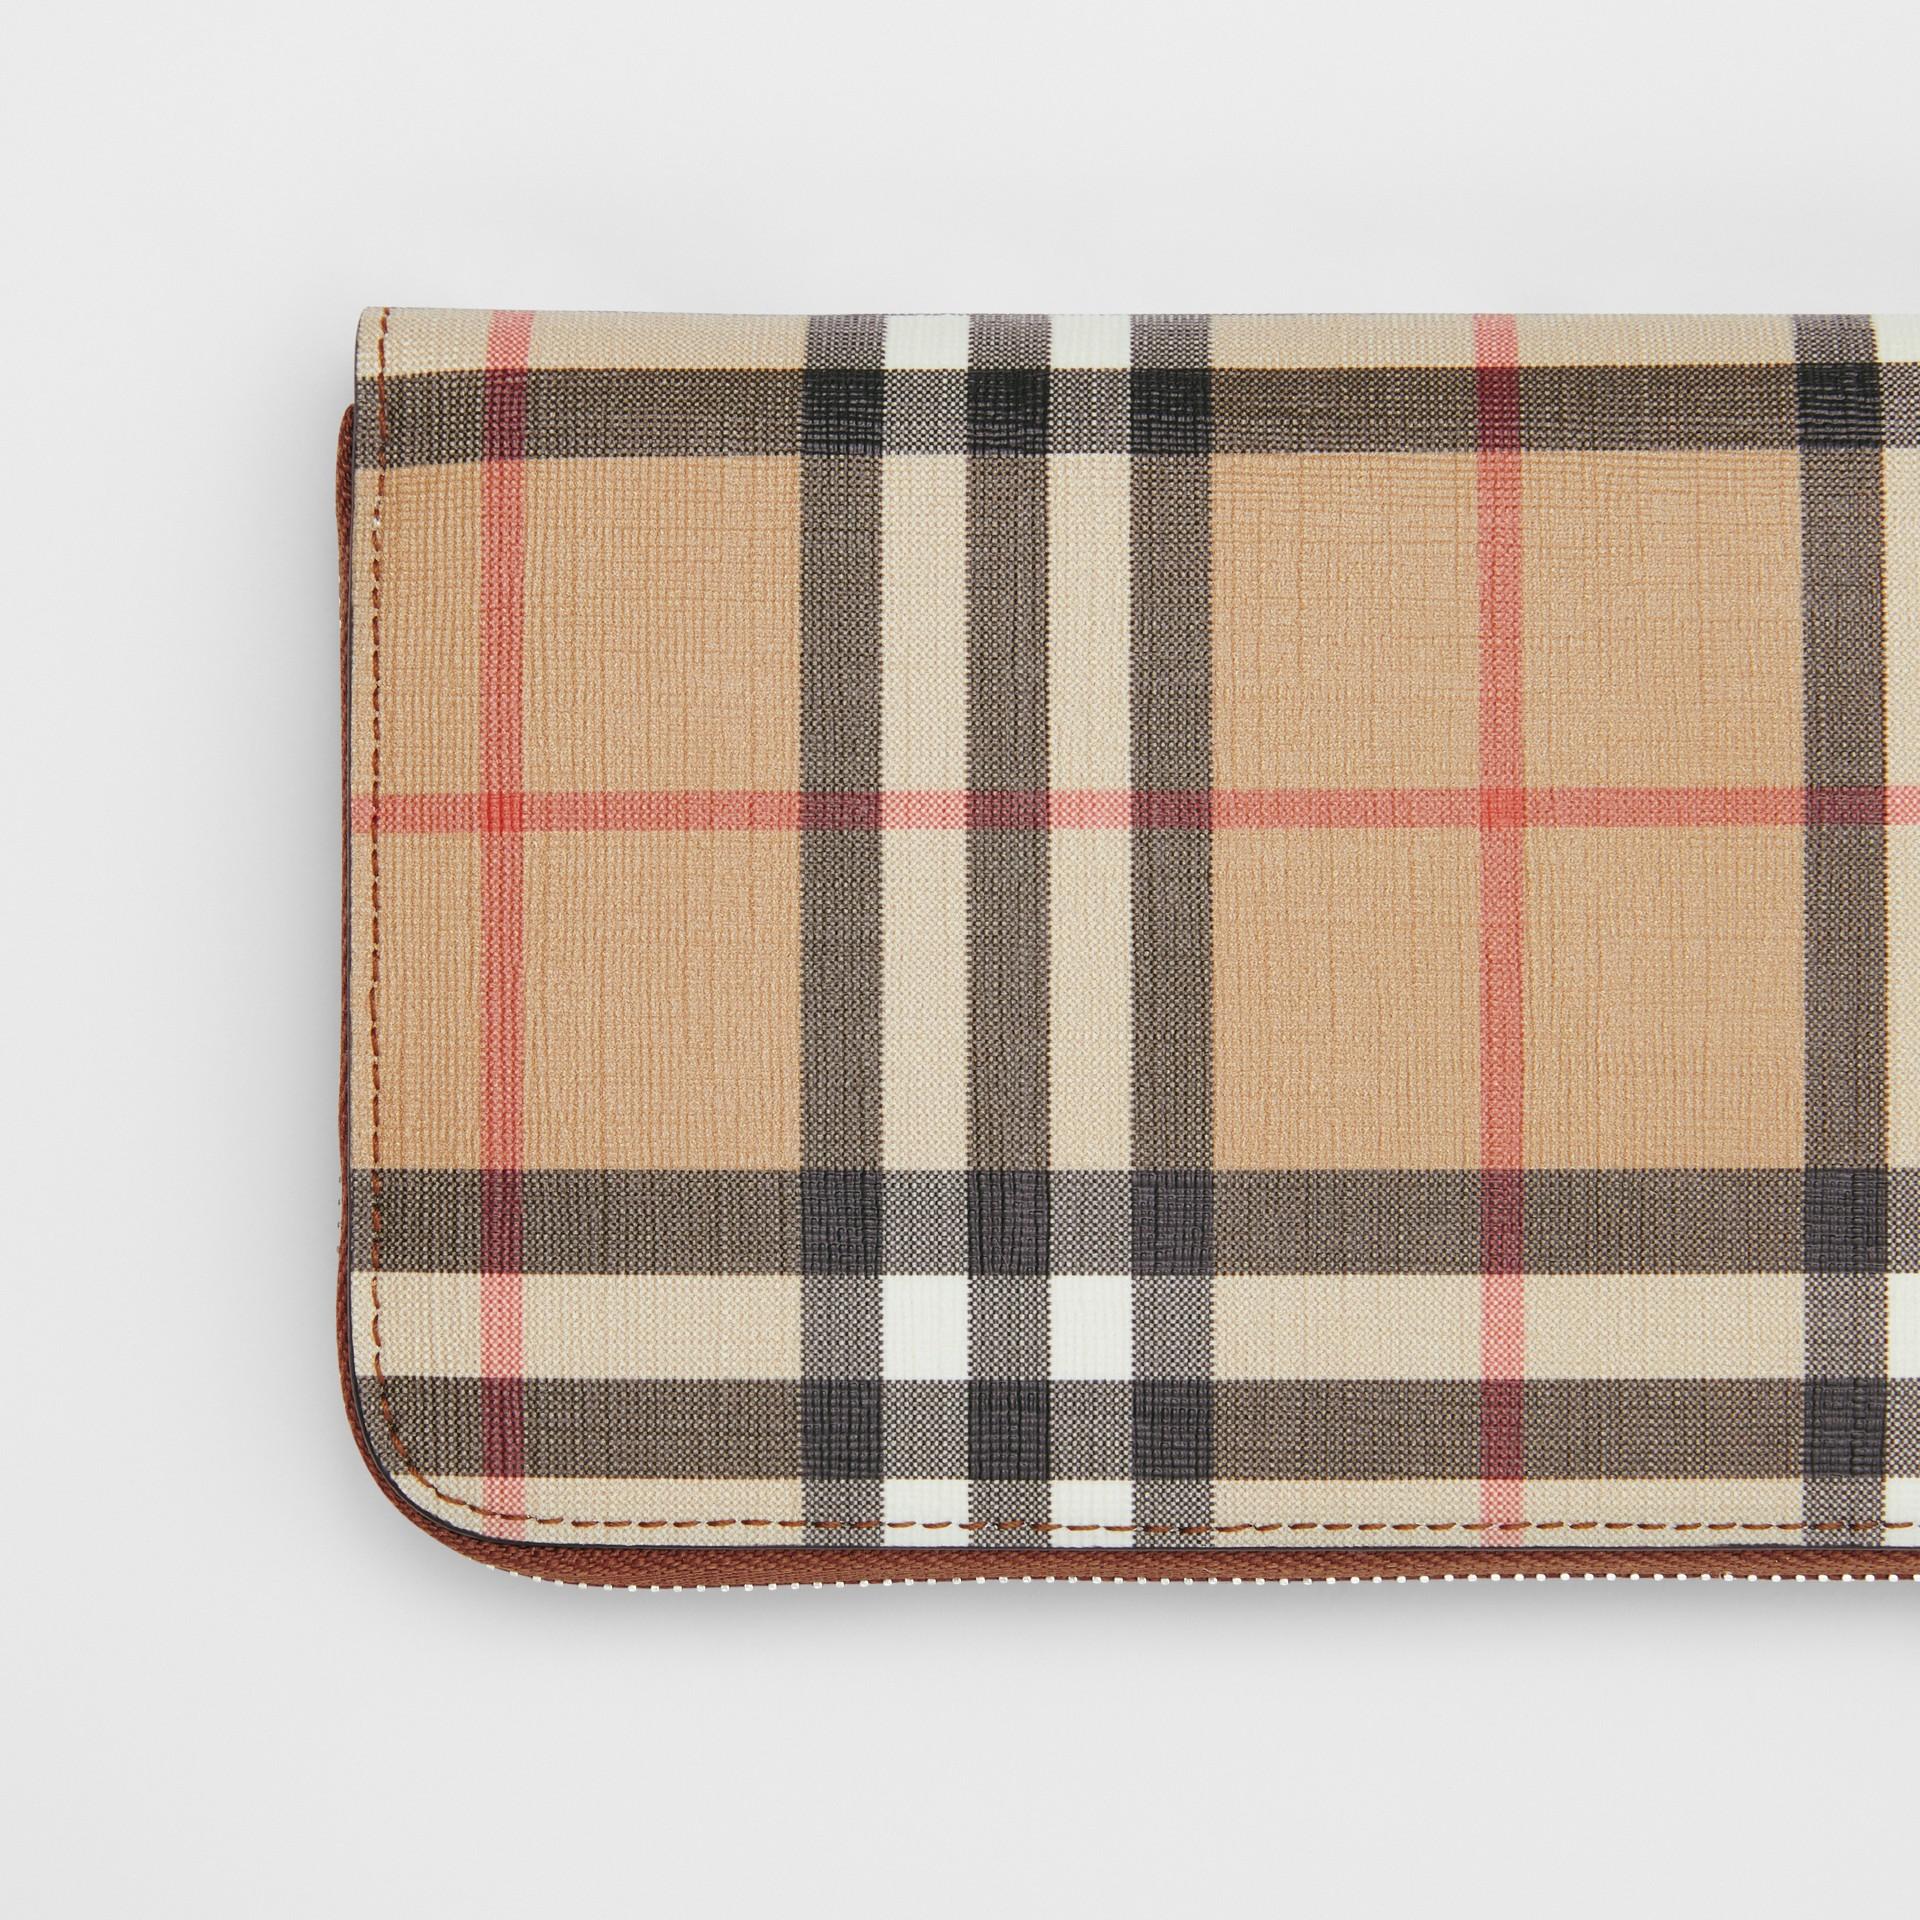 Vintage Check E-canvas Ziparound Wallet in Malt Brown - Women | Burberry Canada - gallery image 1